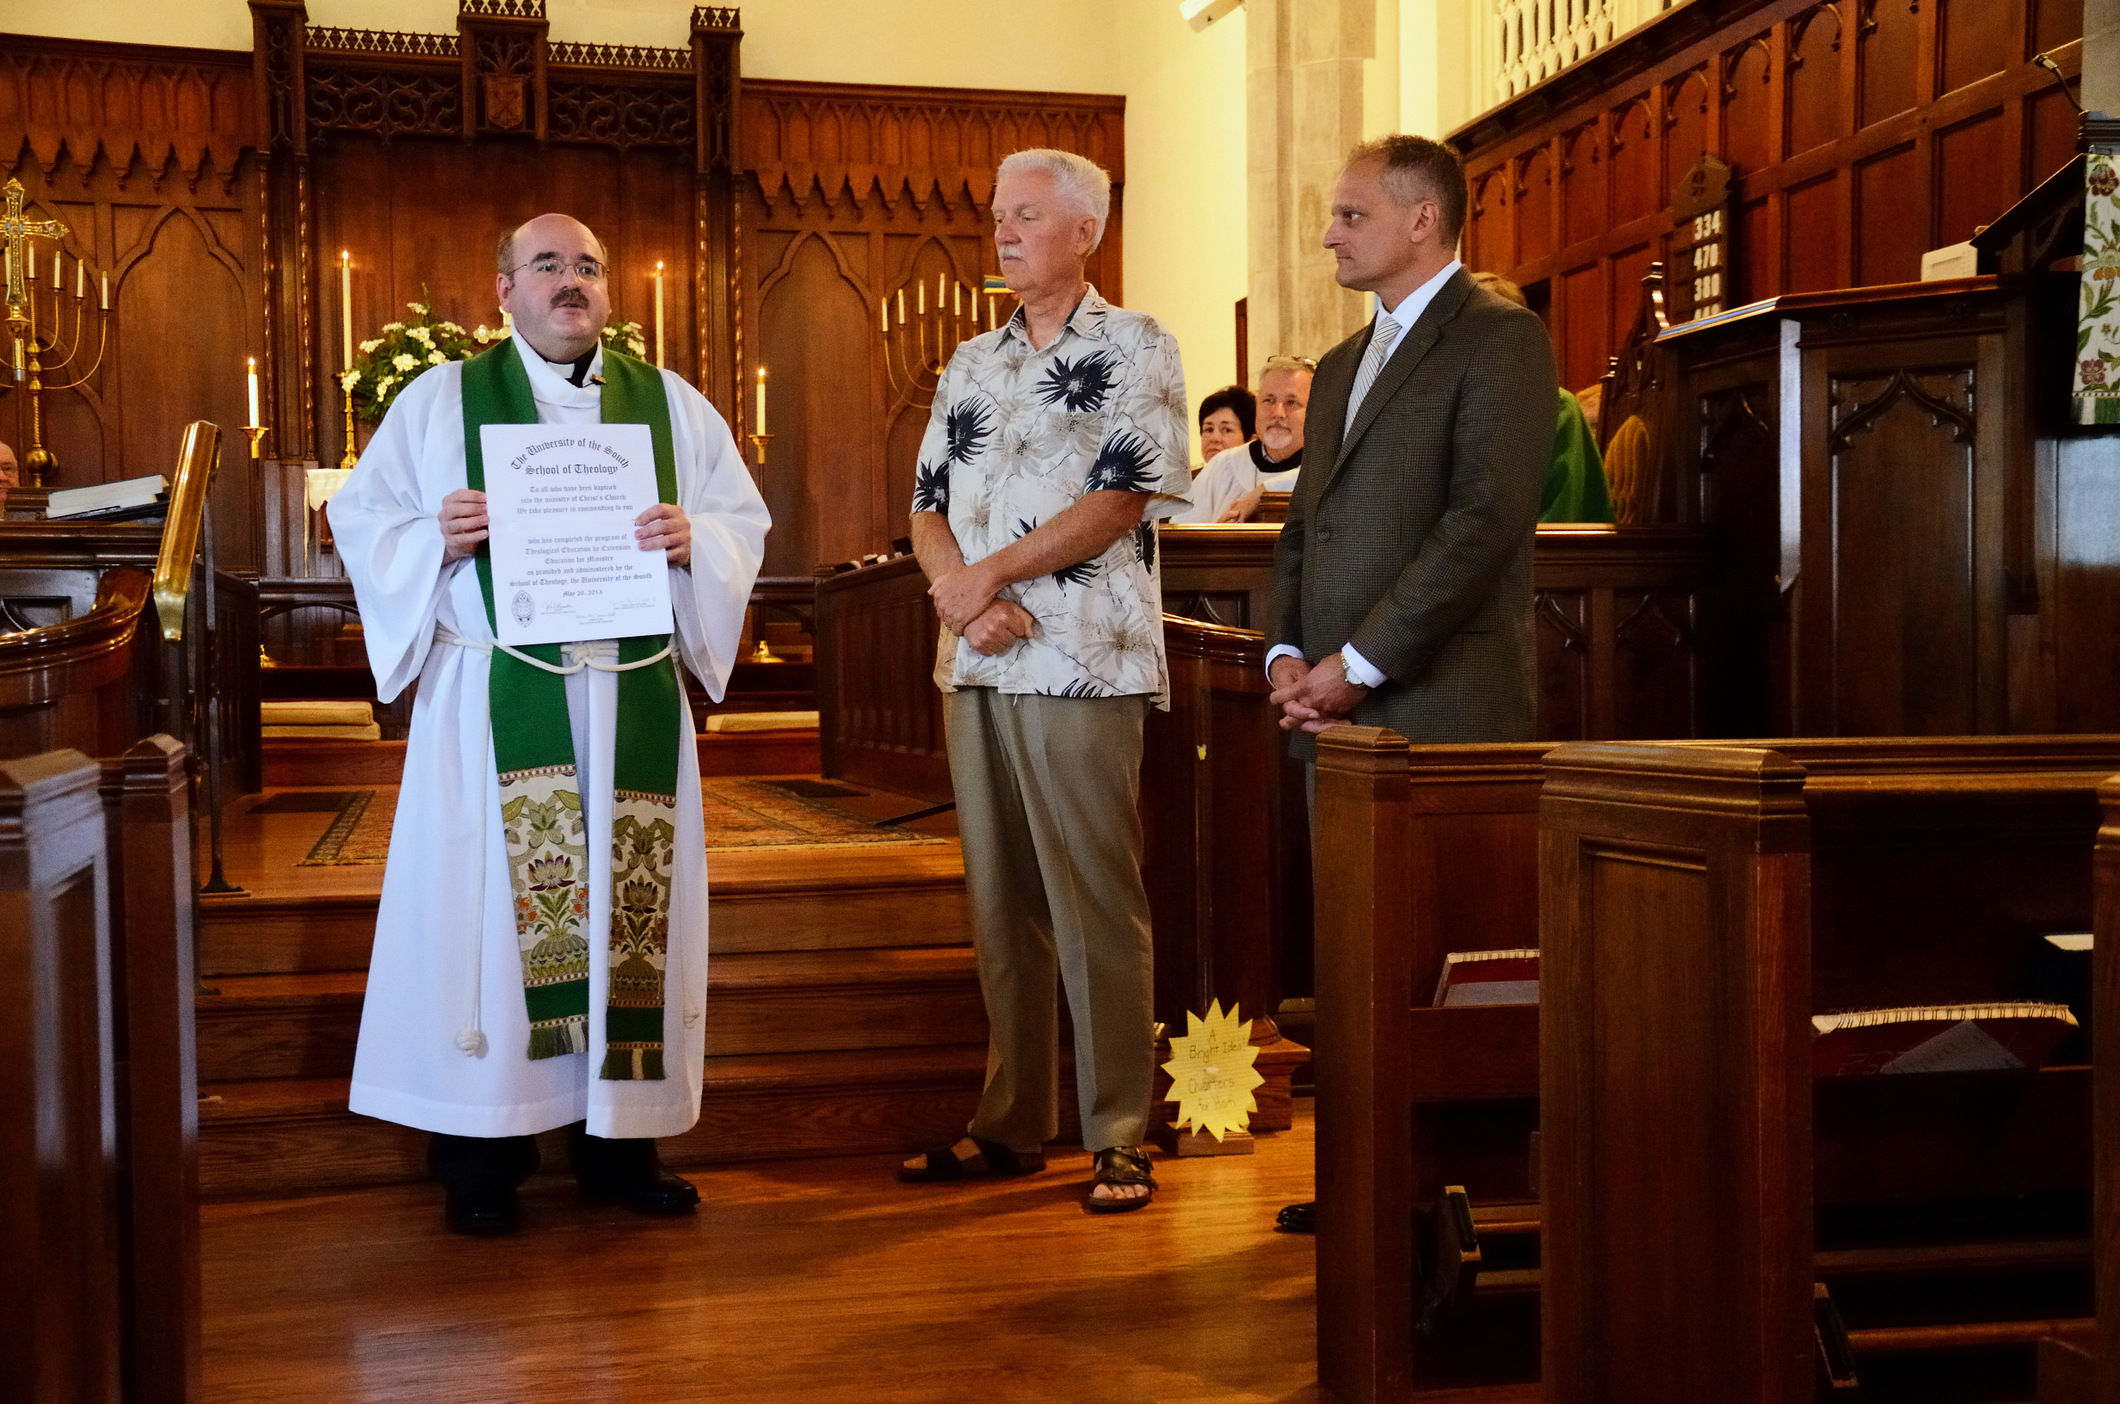 Fr. Jonathan shows off the EfM certificates